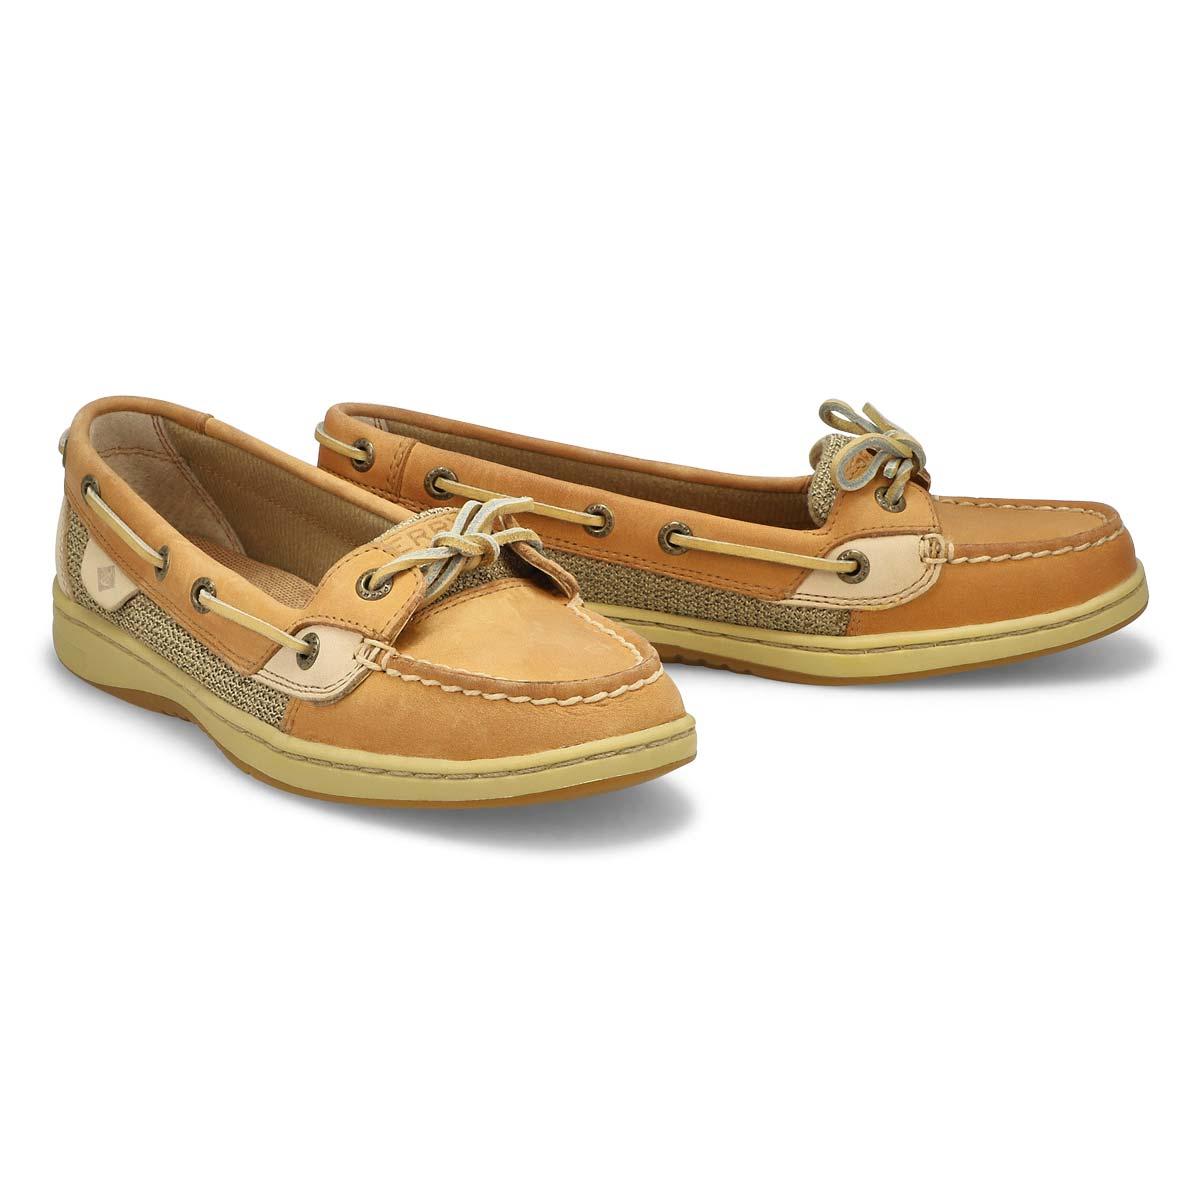 Women's Angelfish Boat Shoe - Linen Oat